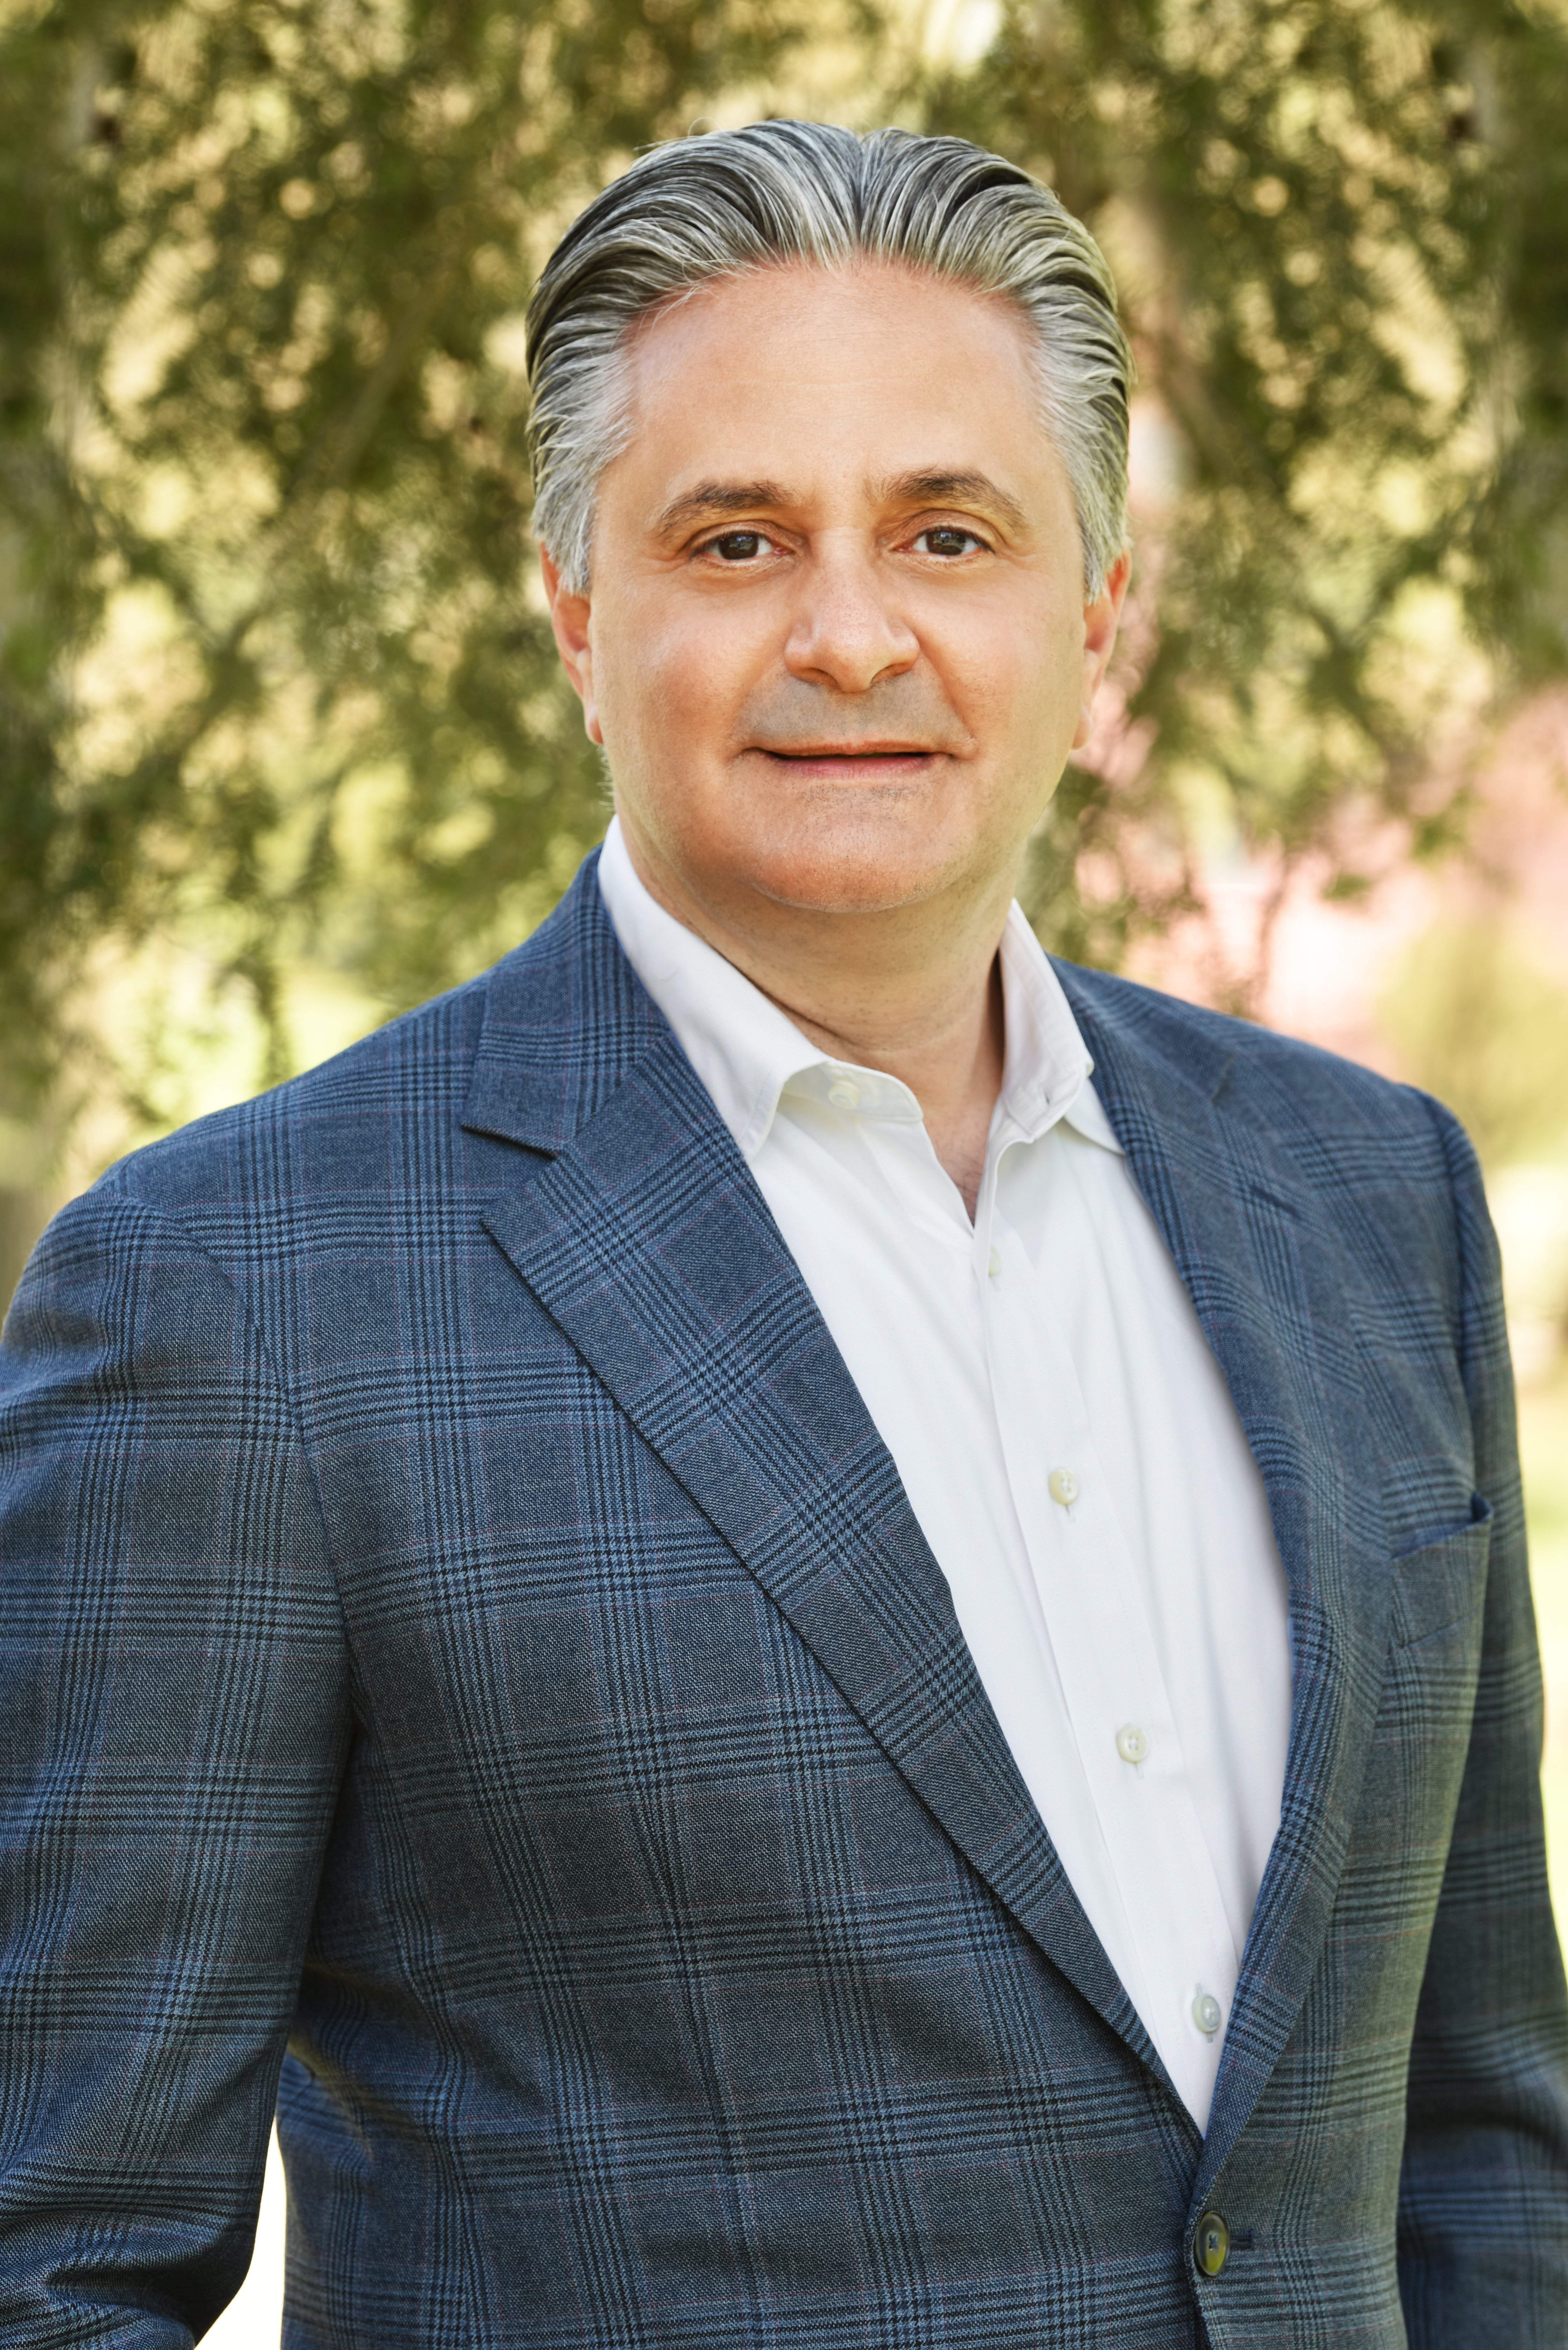 Michael P. Leanza CFP